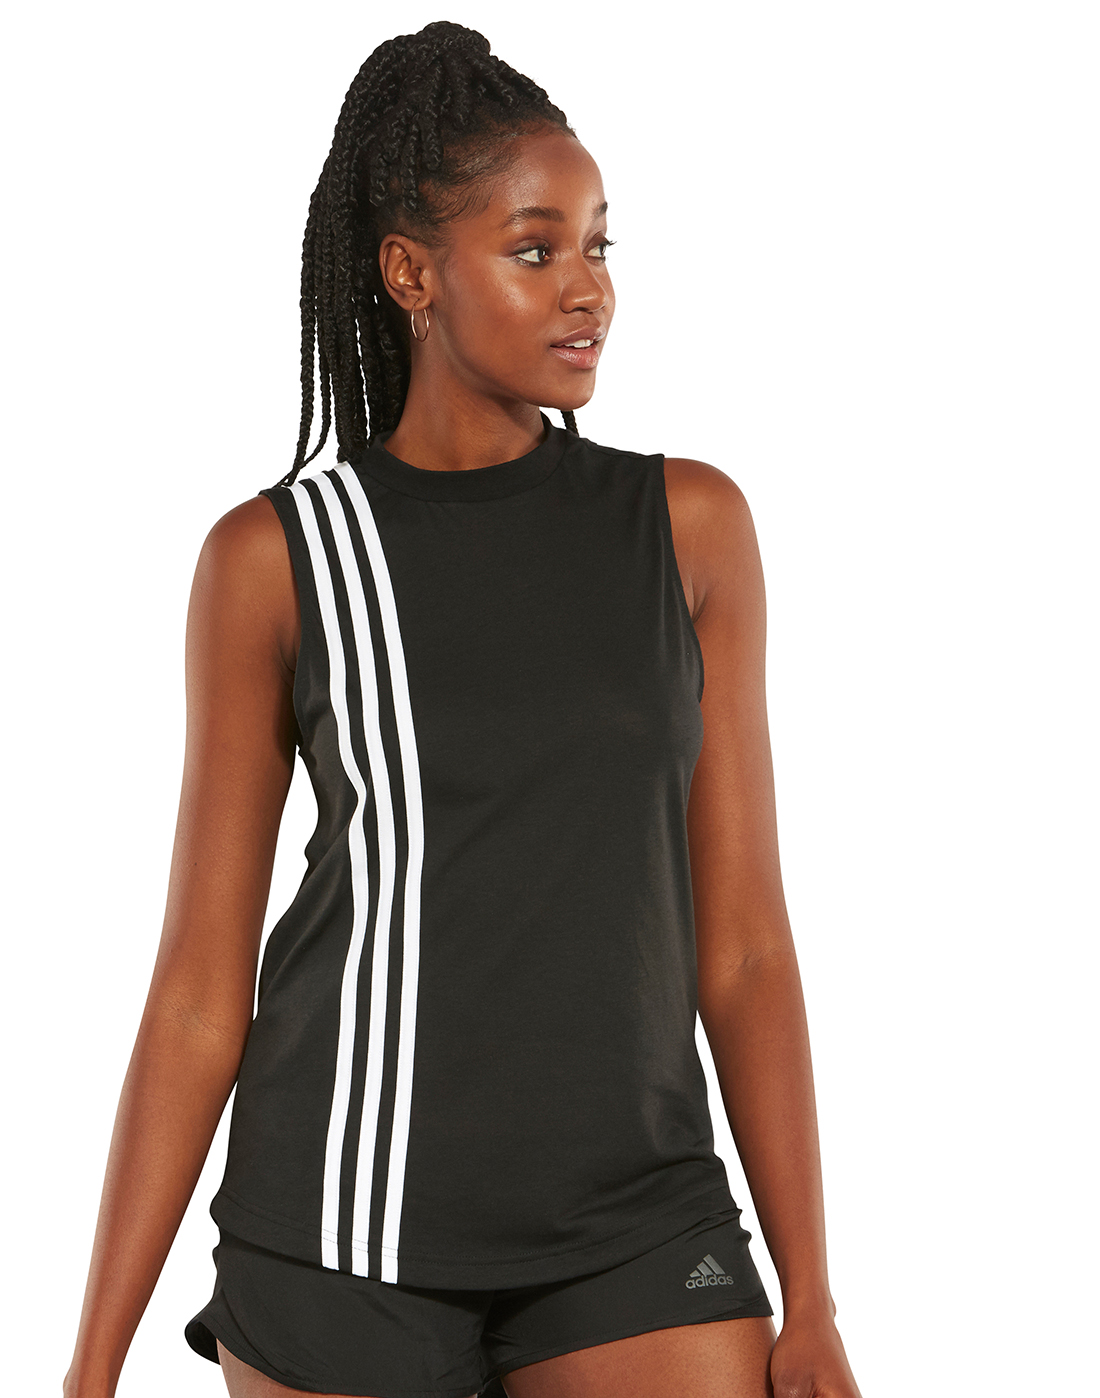 7280d0974ac08 Women's Black & White adidas 3-Stripe Tank Top | Life Style Sports